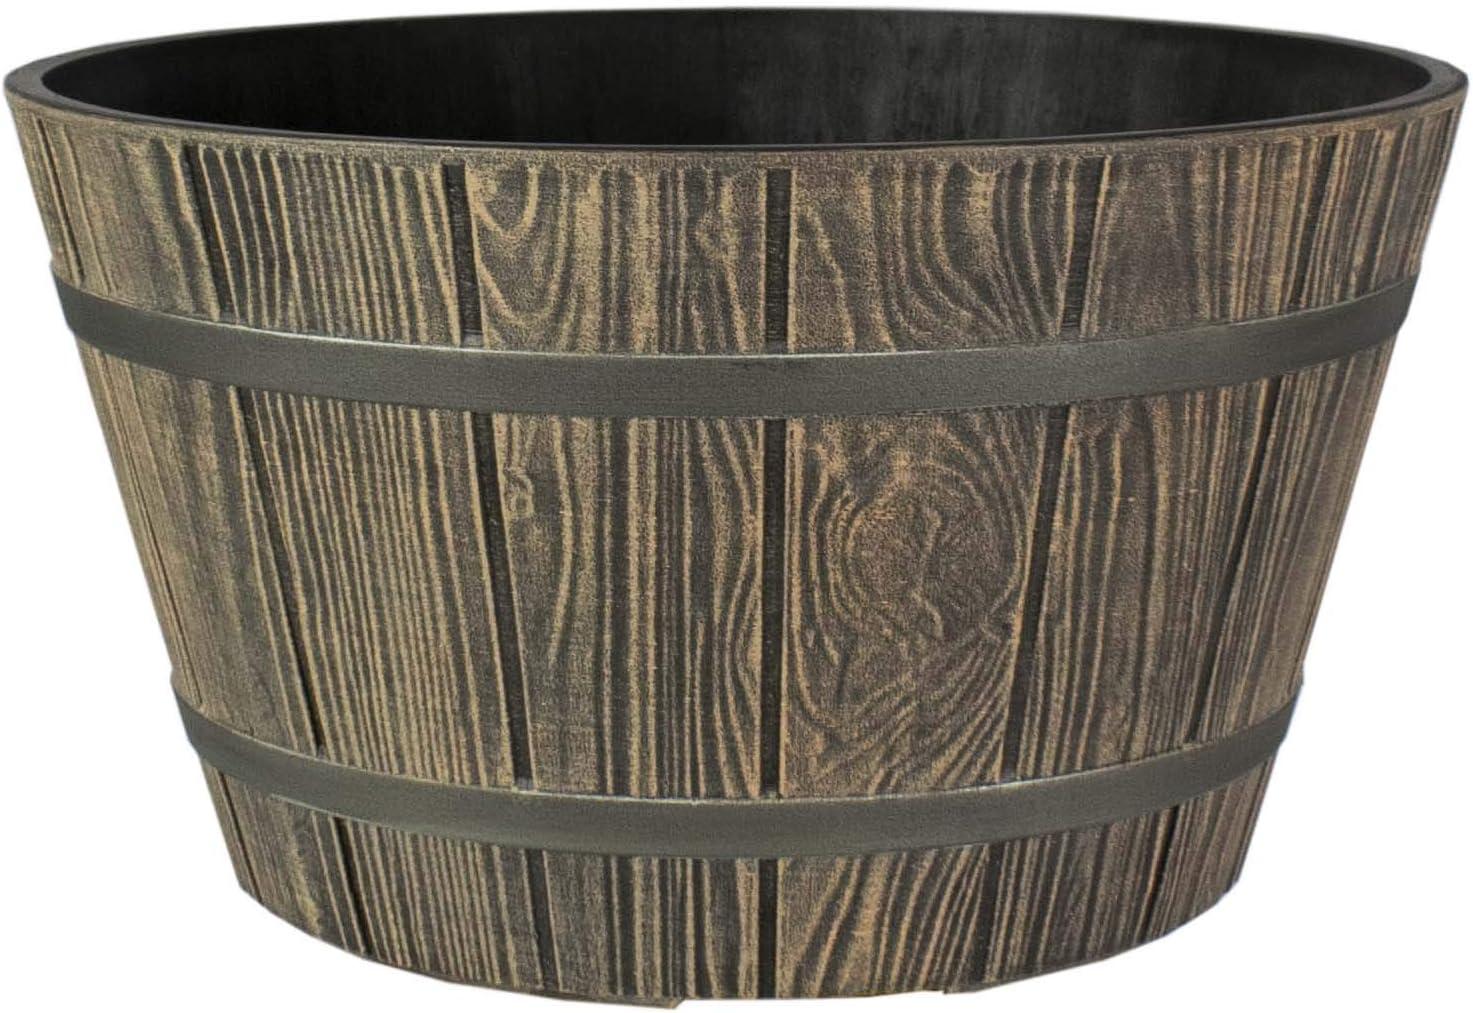 The HC Companies WBP16000P82 Whiskey Barrel Planter, Aged Oak